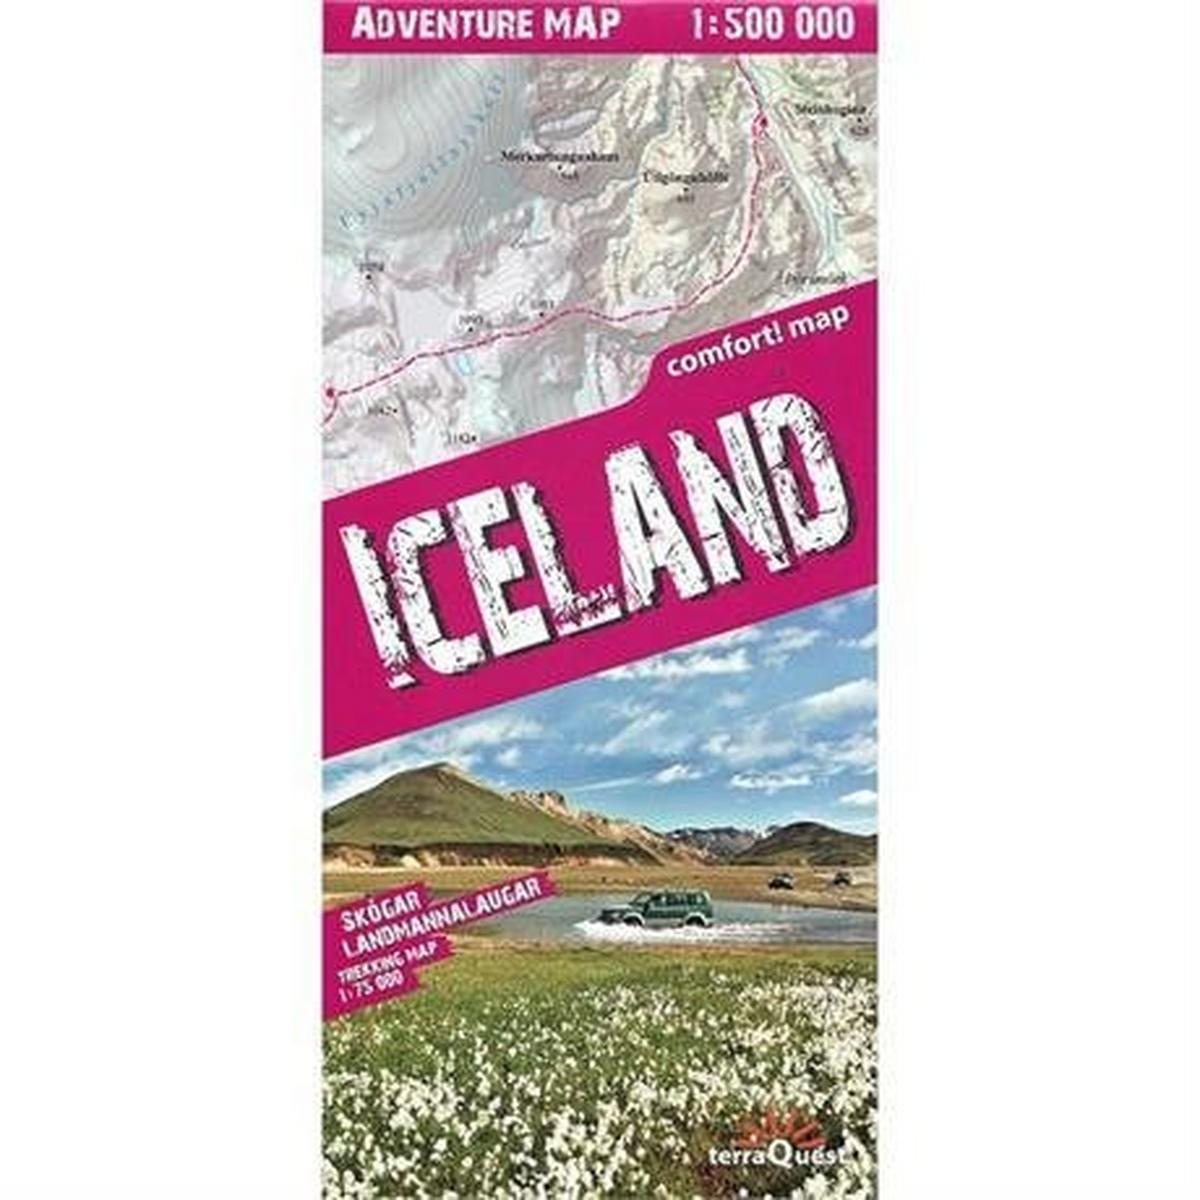 Miscellaneous Terraquest Adventure Map: Iceland 1:500,000